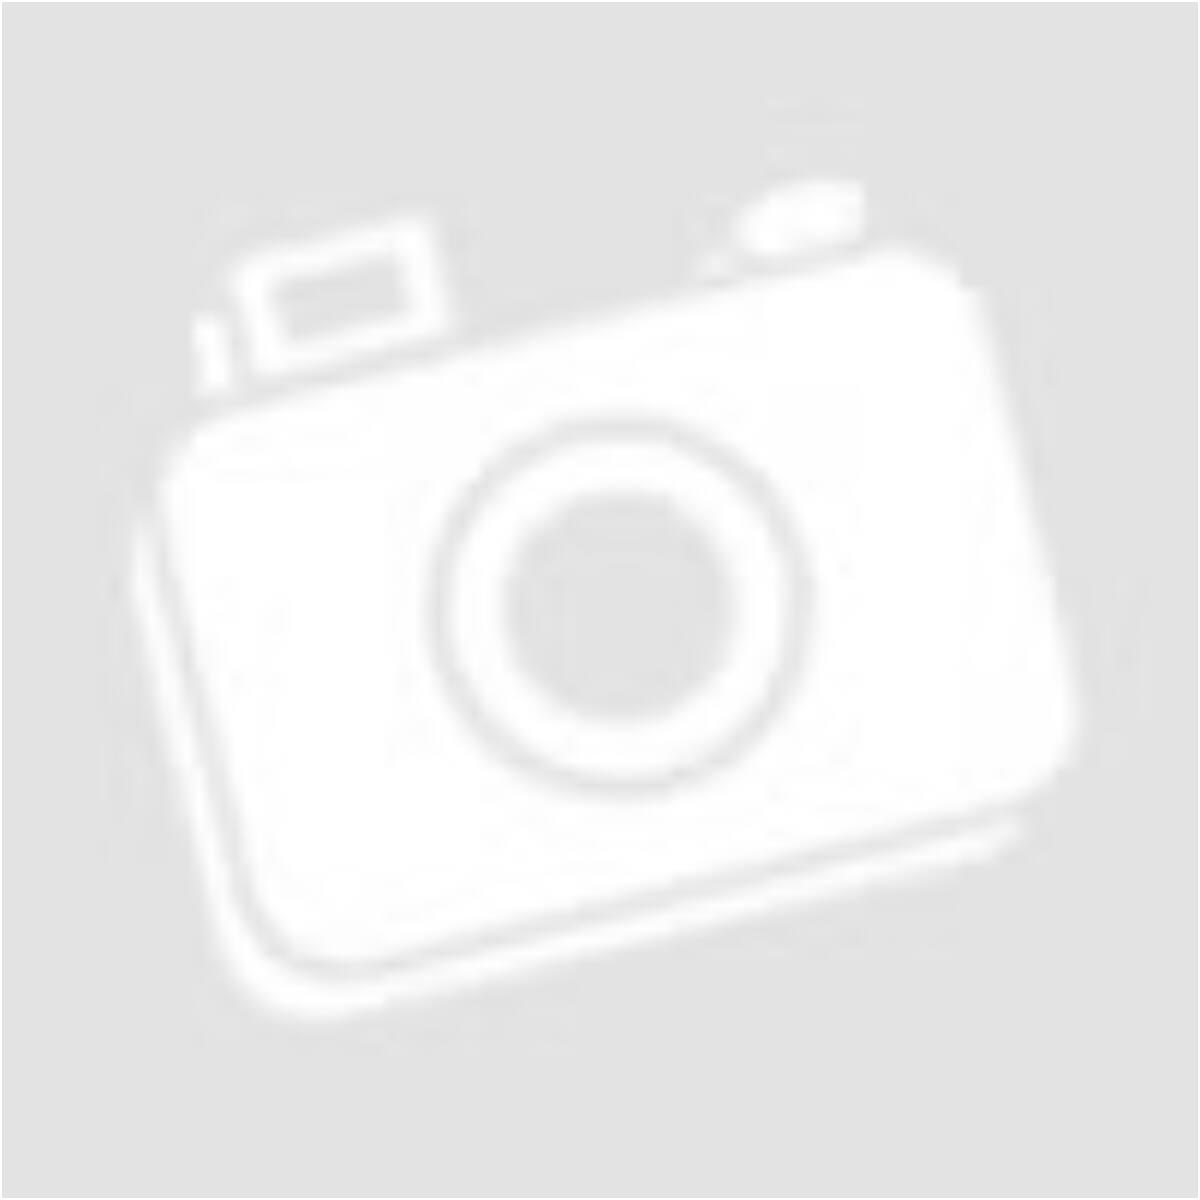 C A barna kord kabát (116) 2f1adbf657